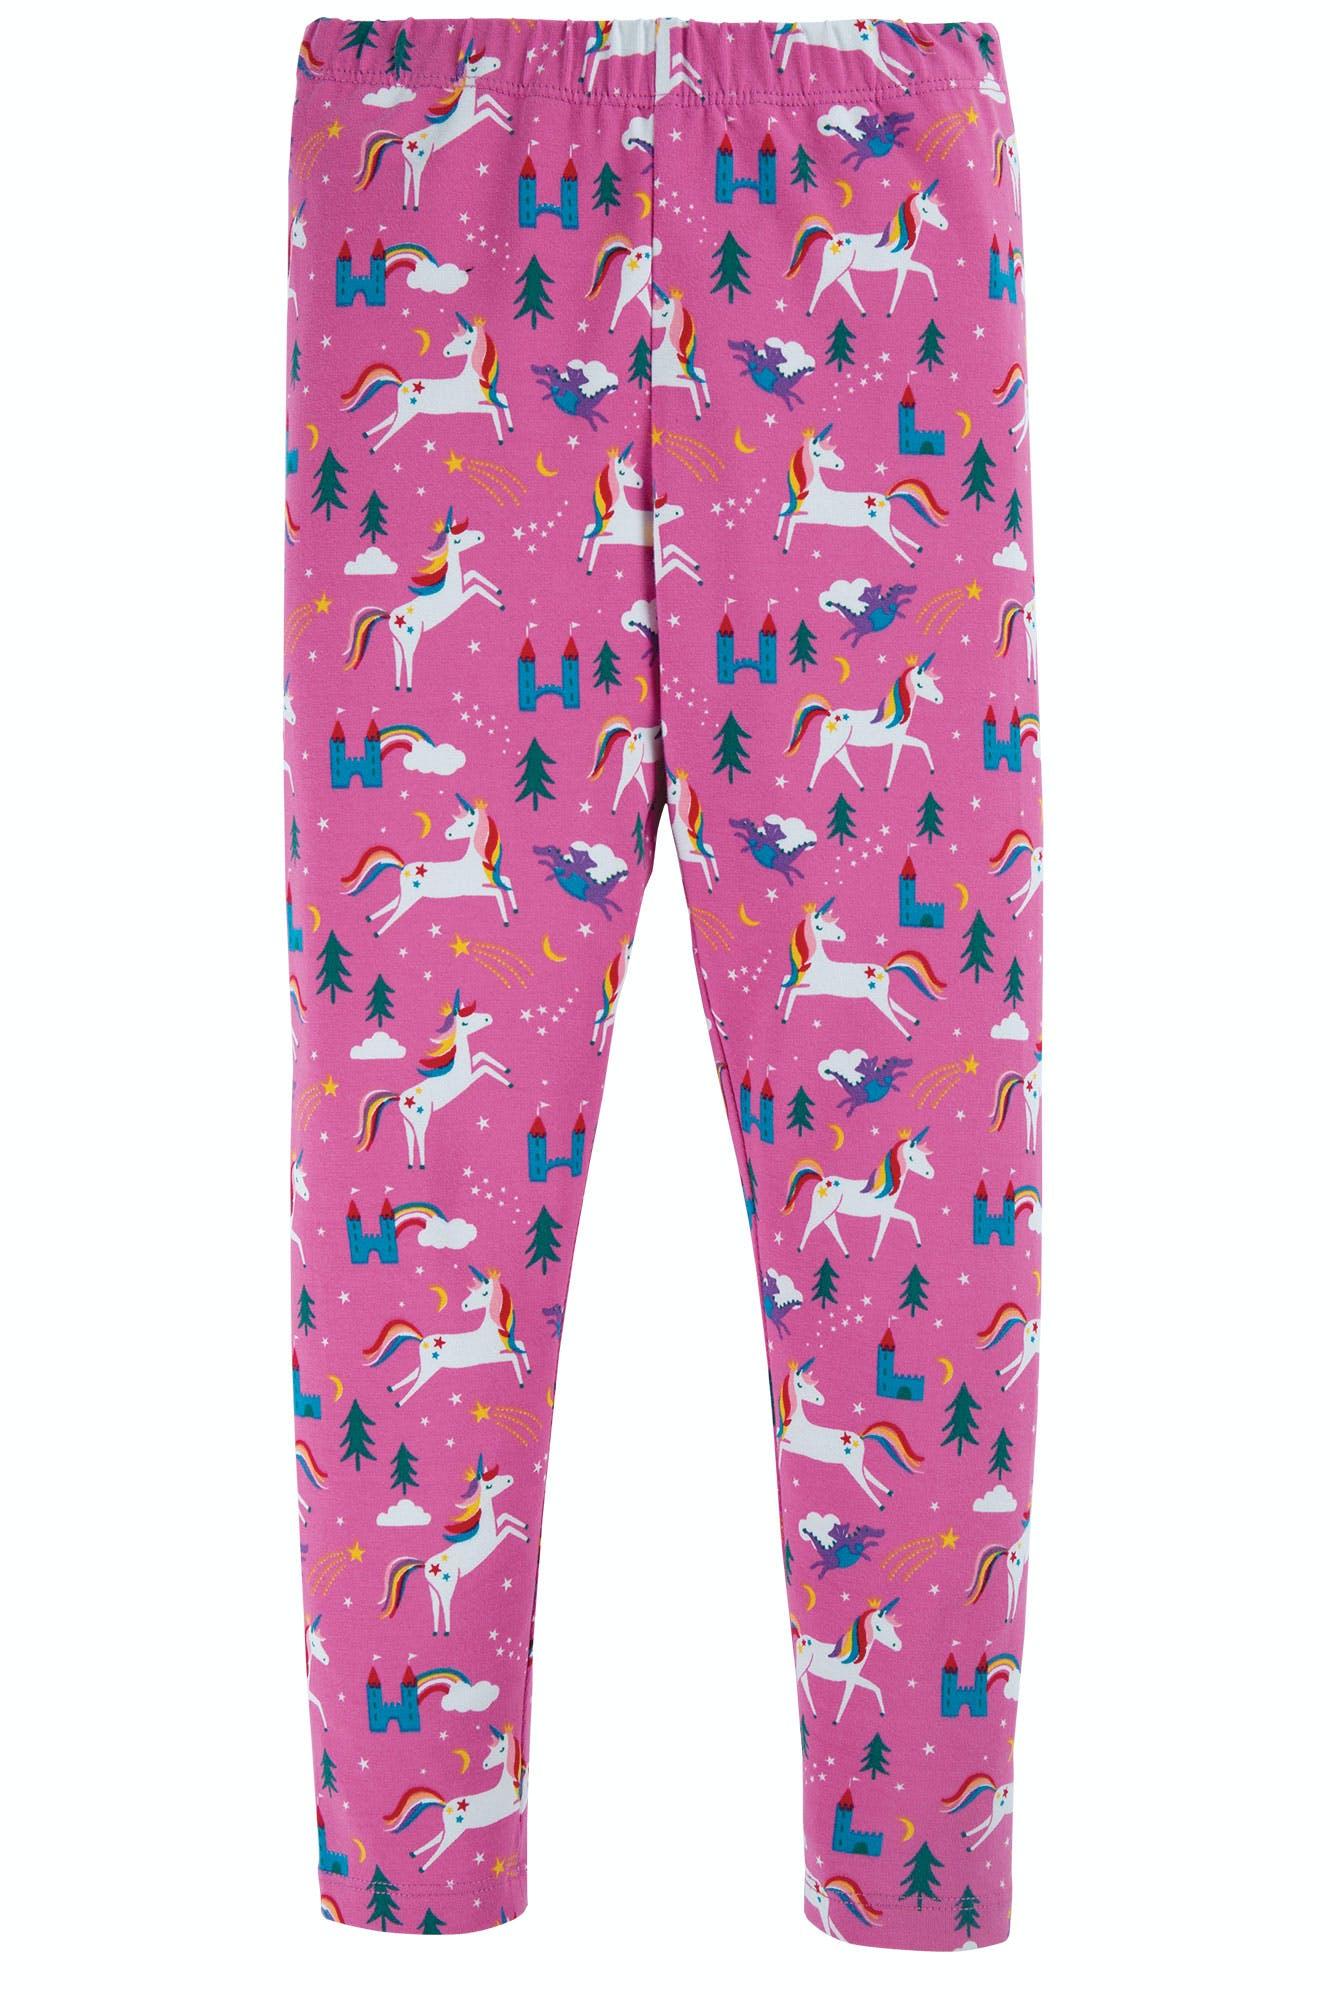 SALE £12.80 Frugi Libby Printed Leggings-Unicorn (WAS £16)